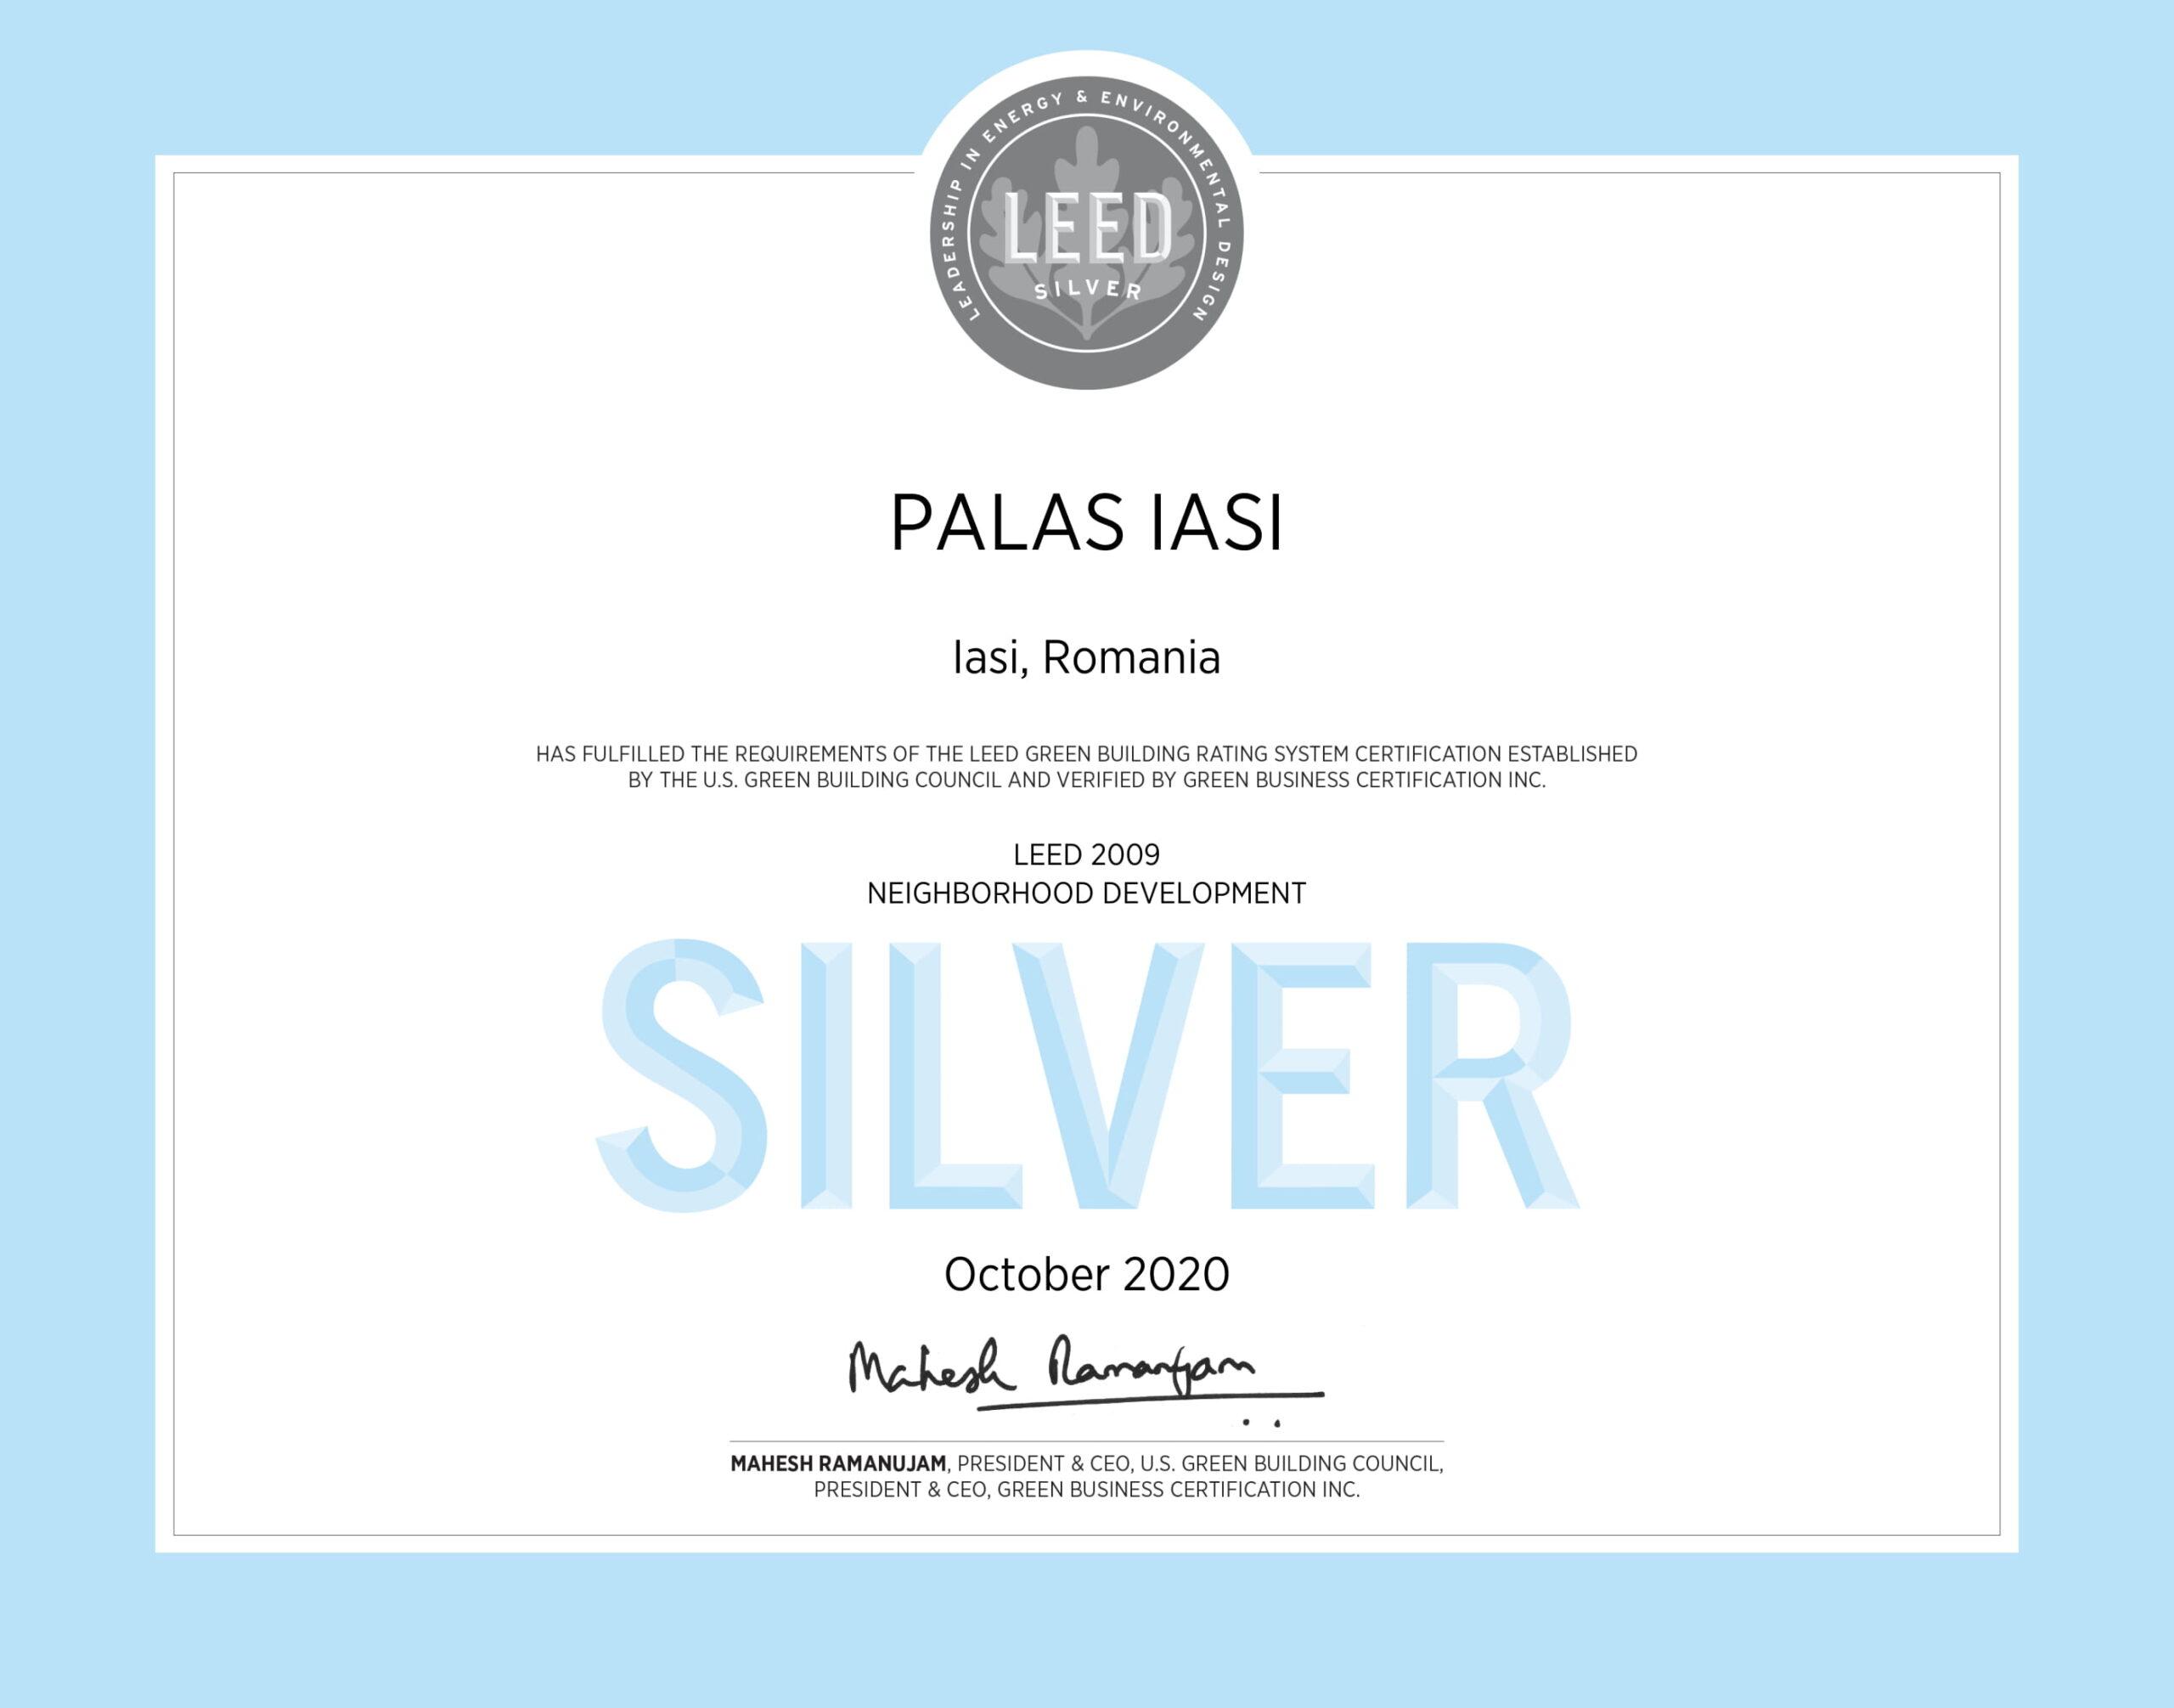 Palas Iasi LEED Neighborhood Development Silver